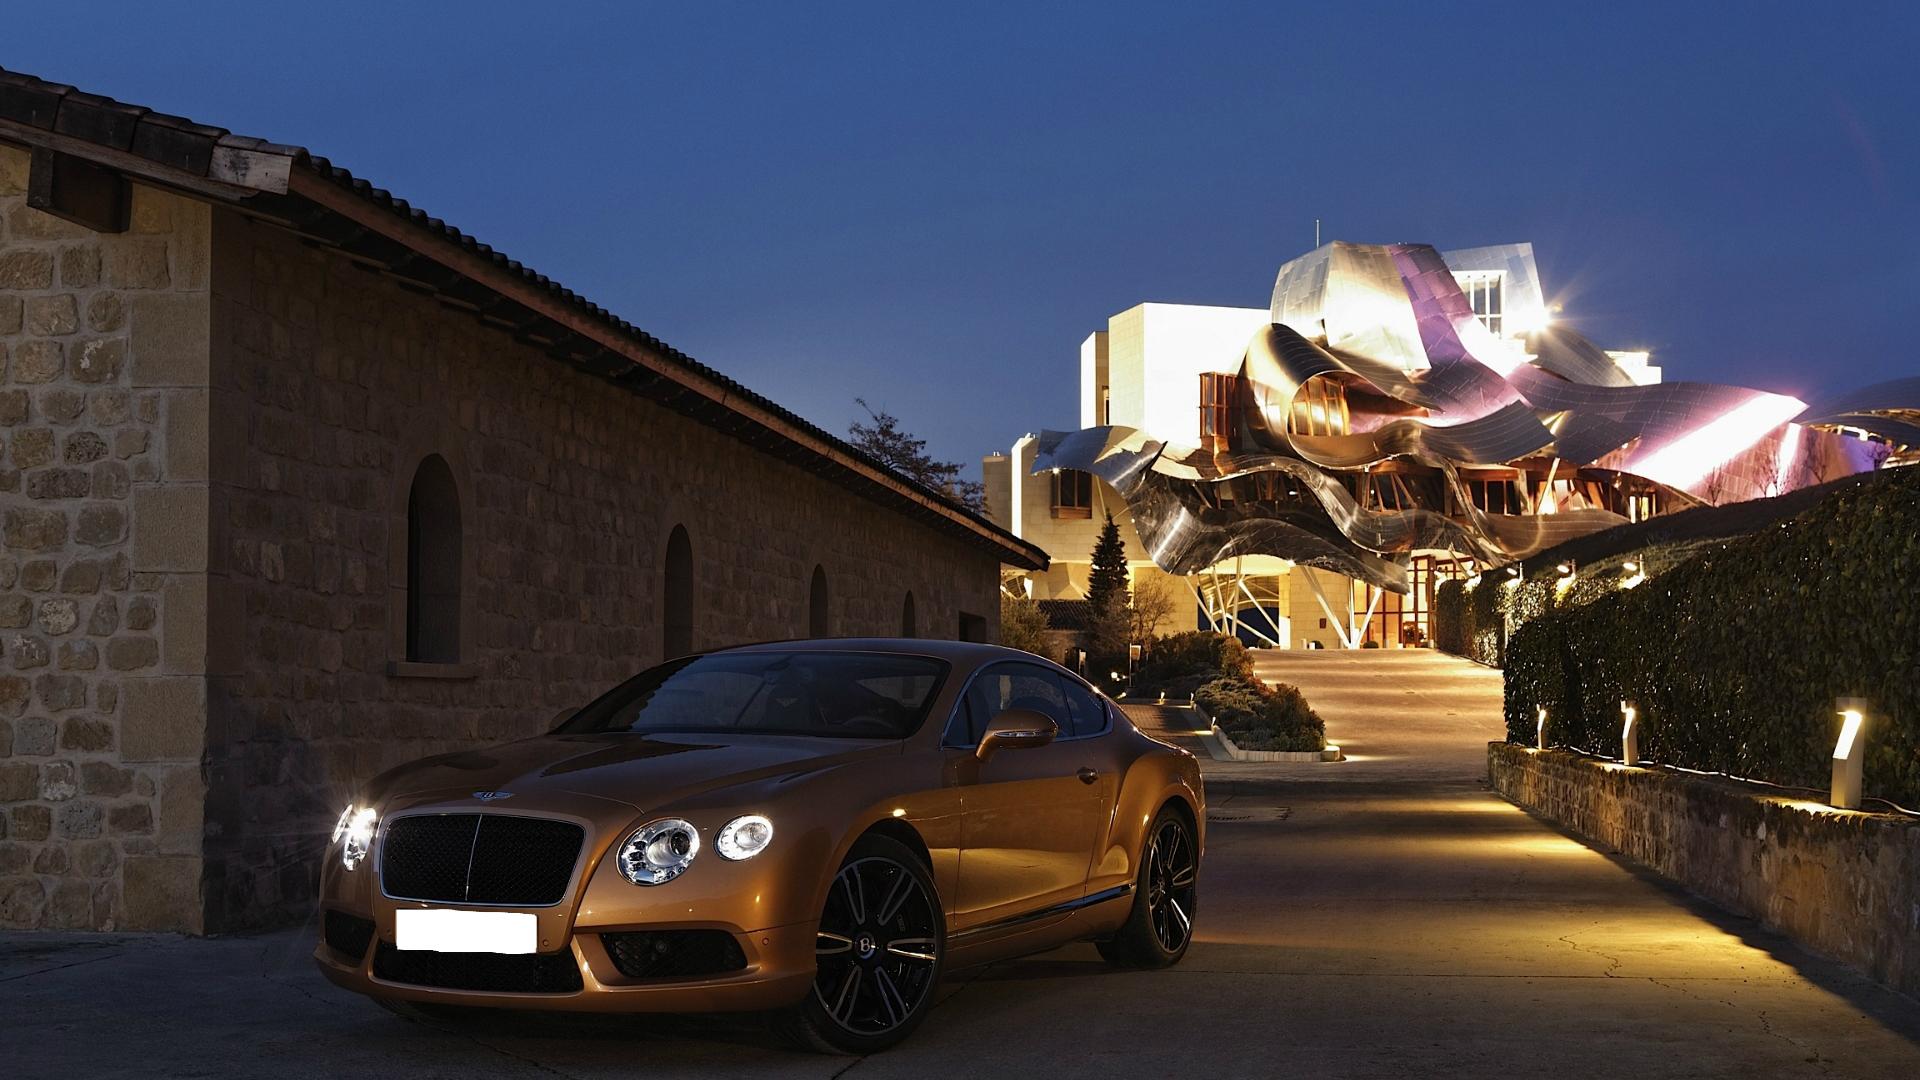 Jaguar, Cadillac BLS, Nissan, Bentley, Rolls Royce, LandRover Freelander Chevrolet, Hyundai, Ford Fiesta, Skoda Octavia, Alfa Romeo, leo, Fiat